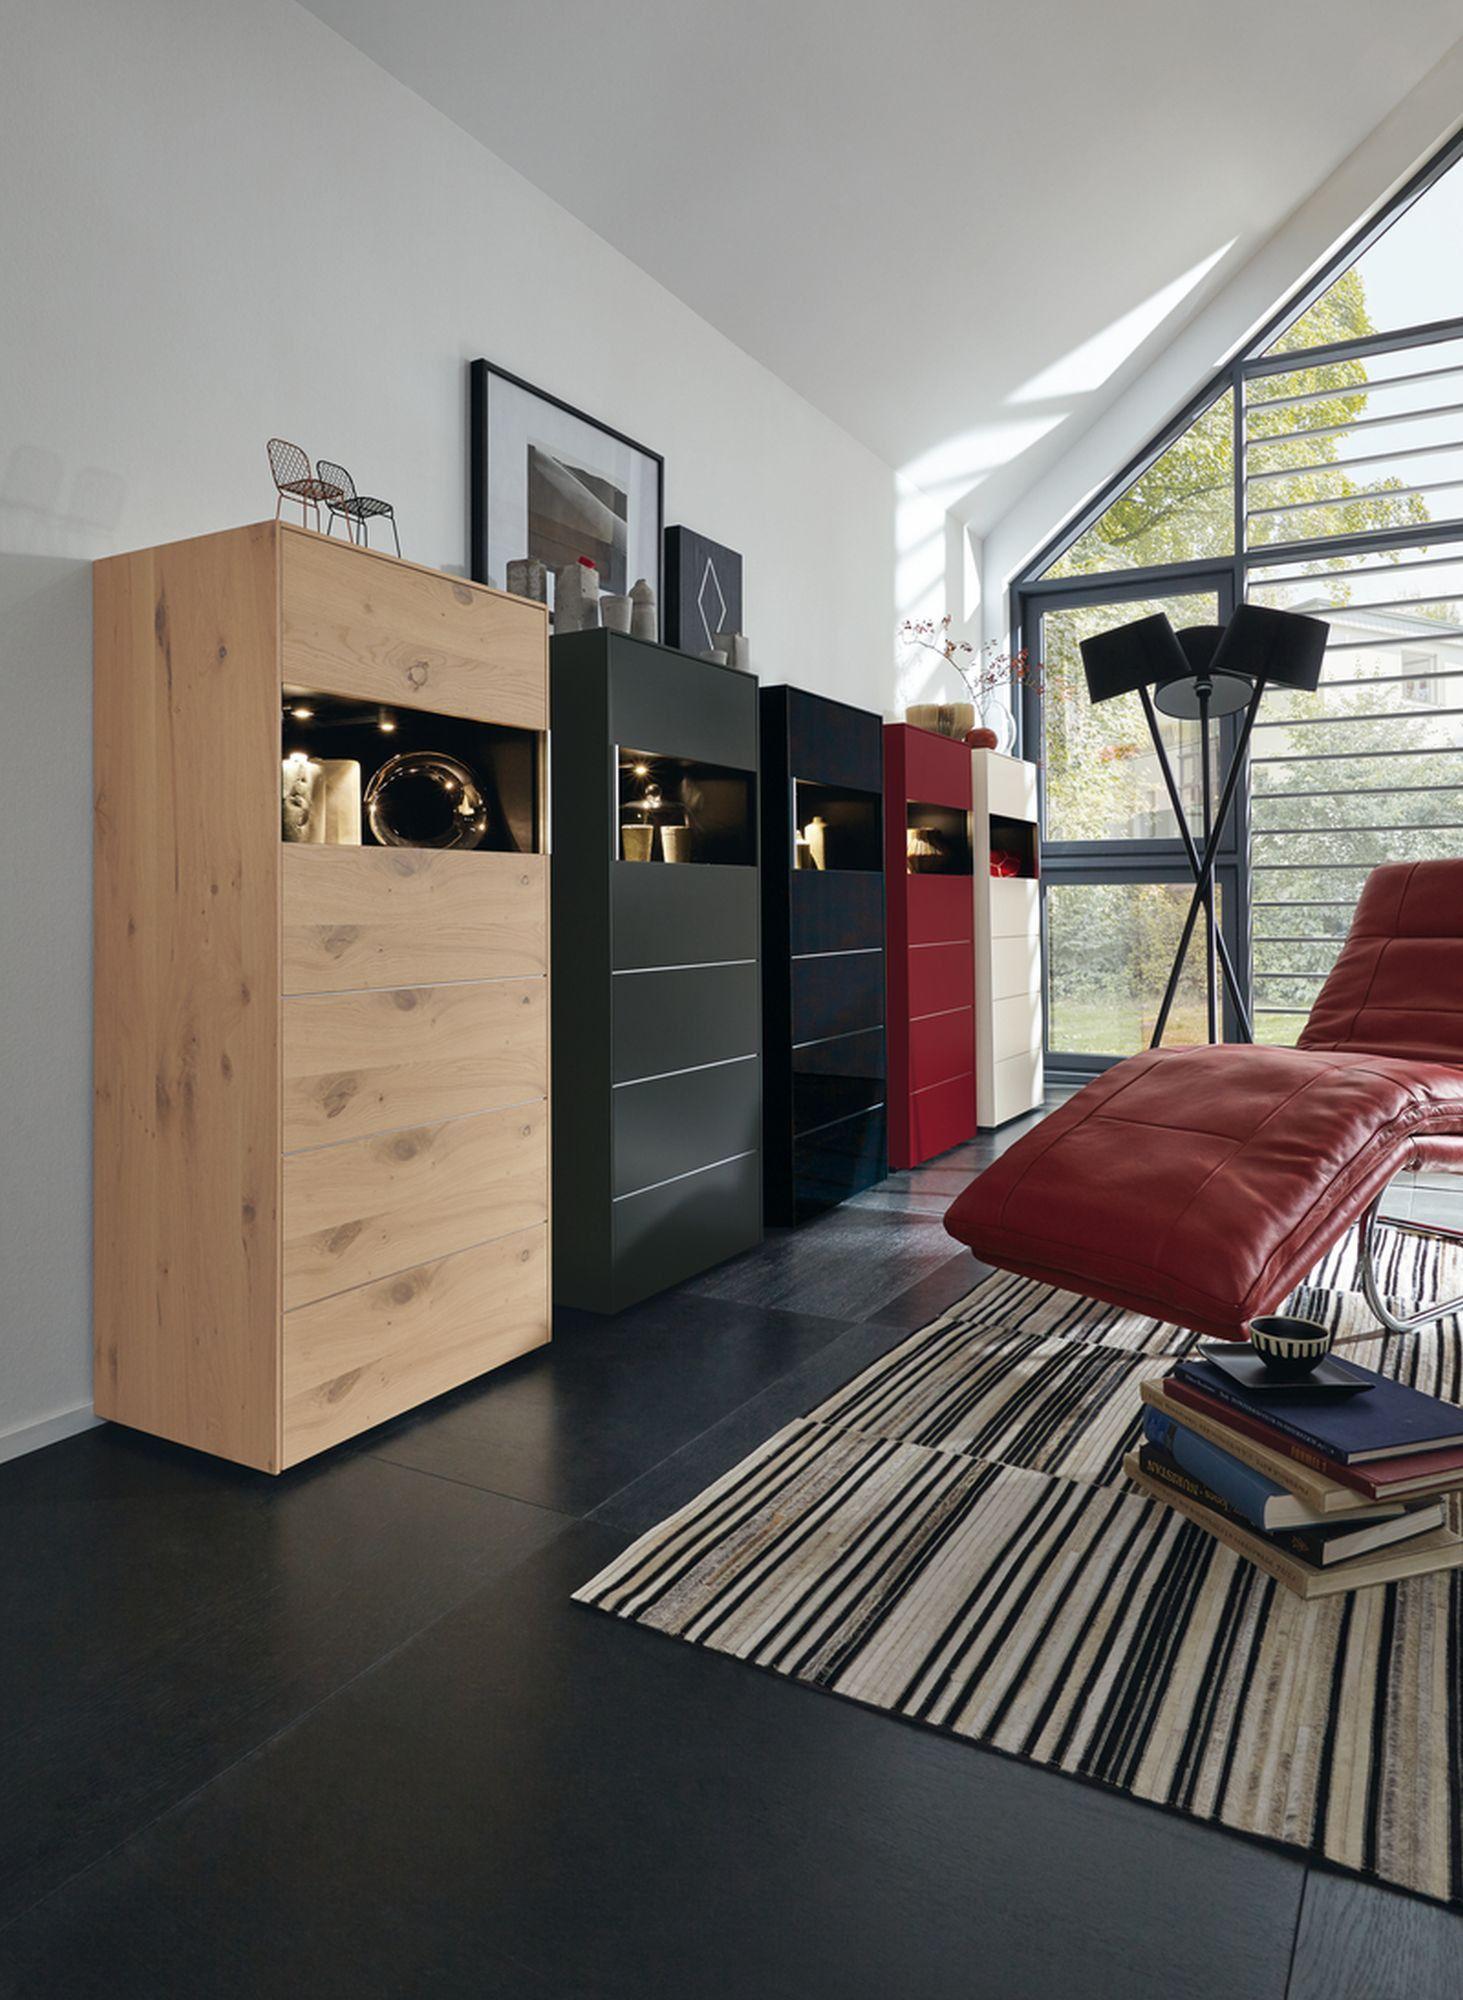 vitrine mr q media musterring optiwohnwelt musterring. Black Bedroom Furniture Sets. Home Design Ideas